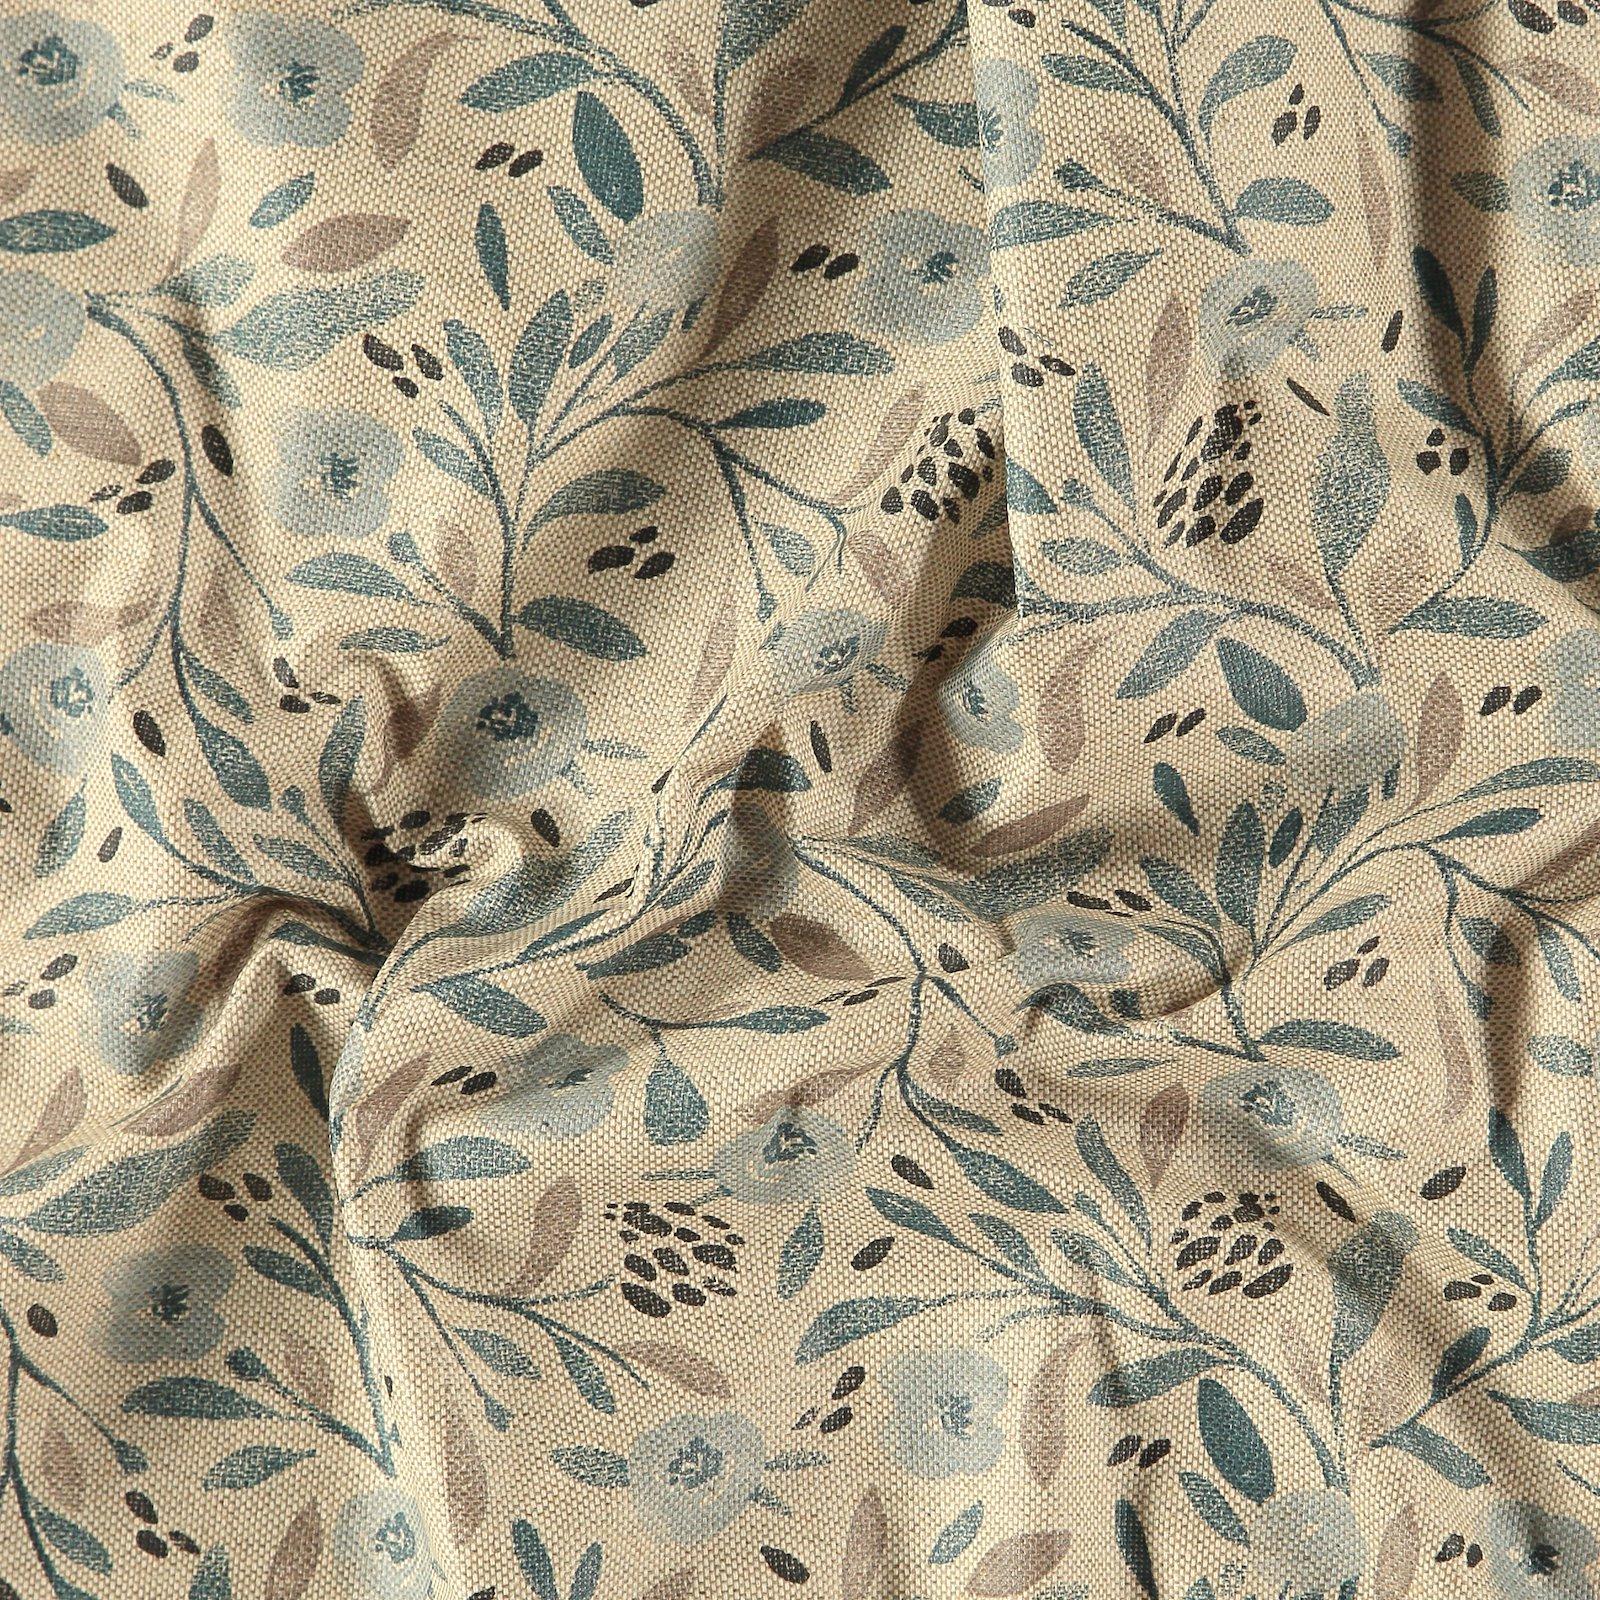 Woven oilcloth linenlook w blue flowers